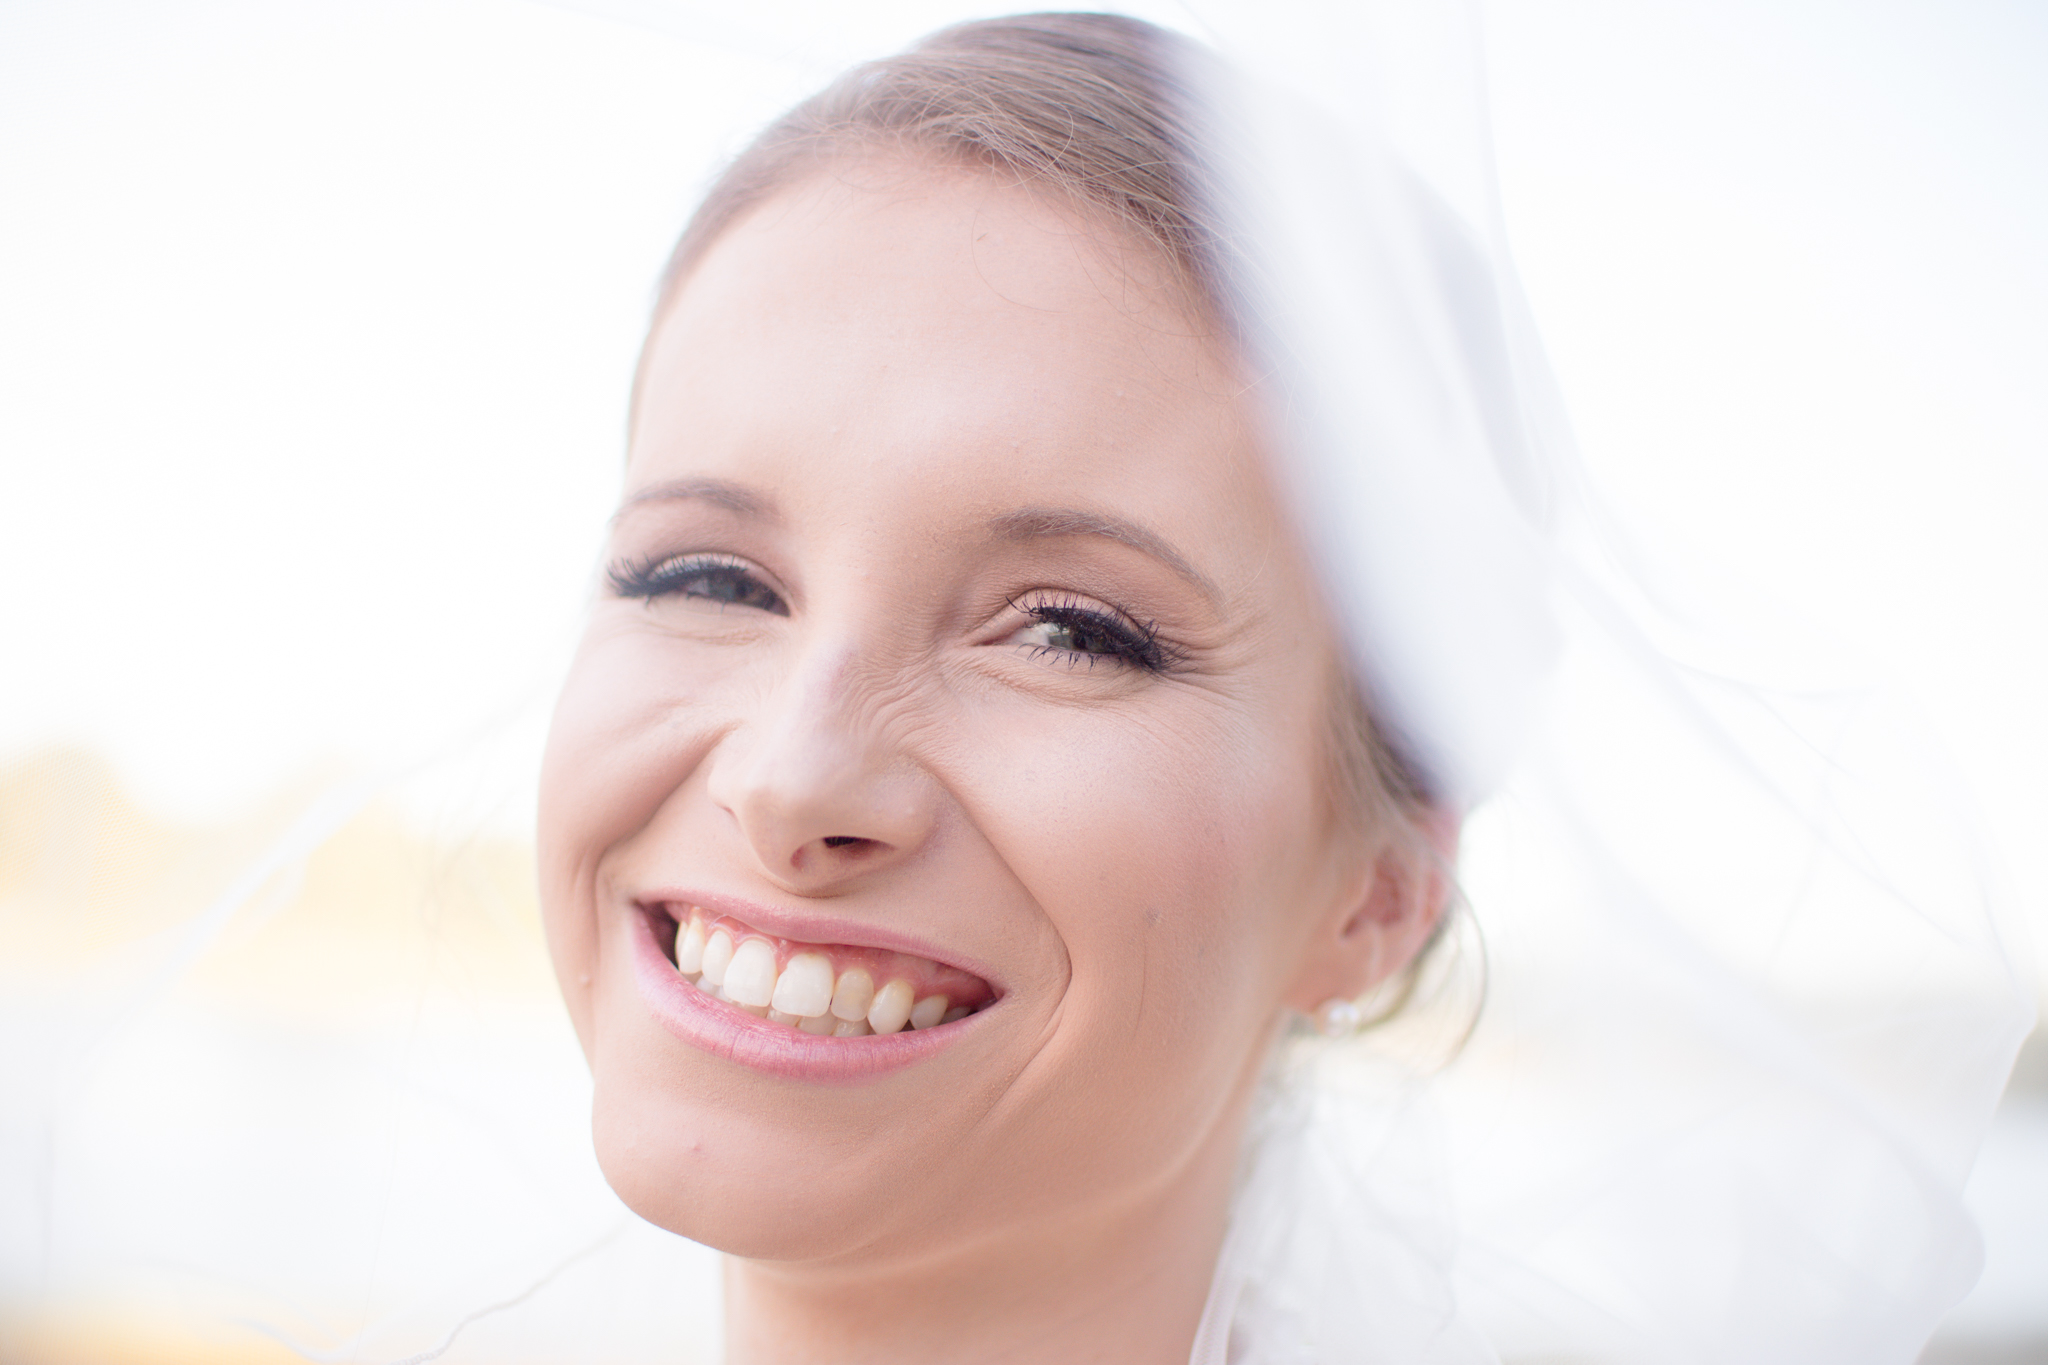 bridalportraits (16 of 49).JPG